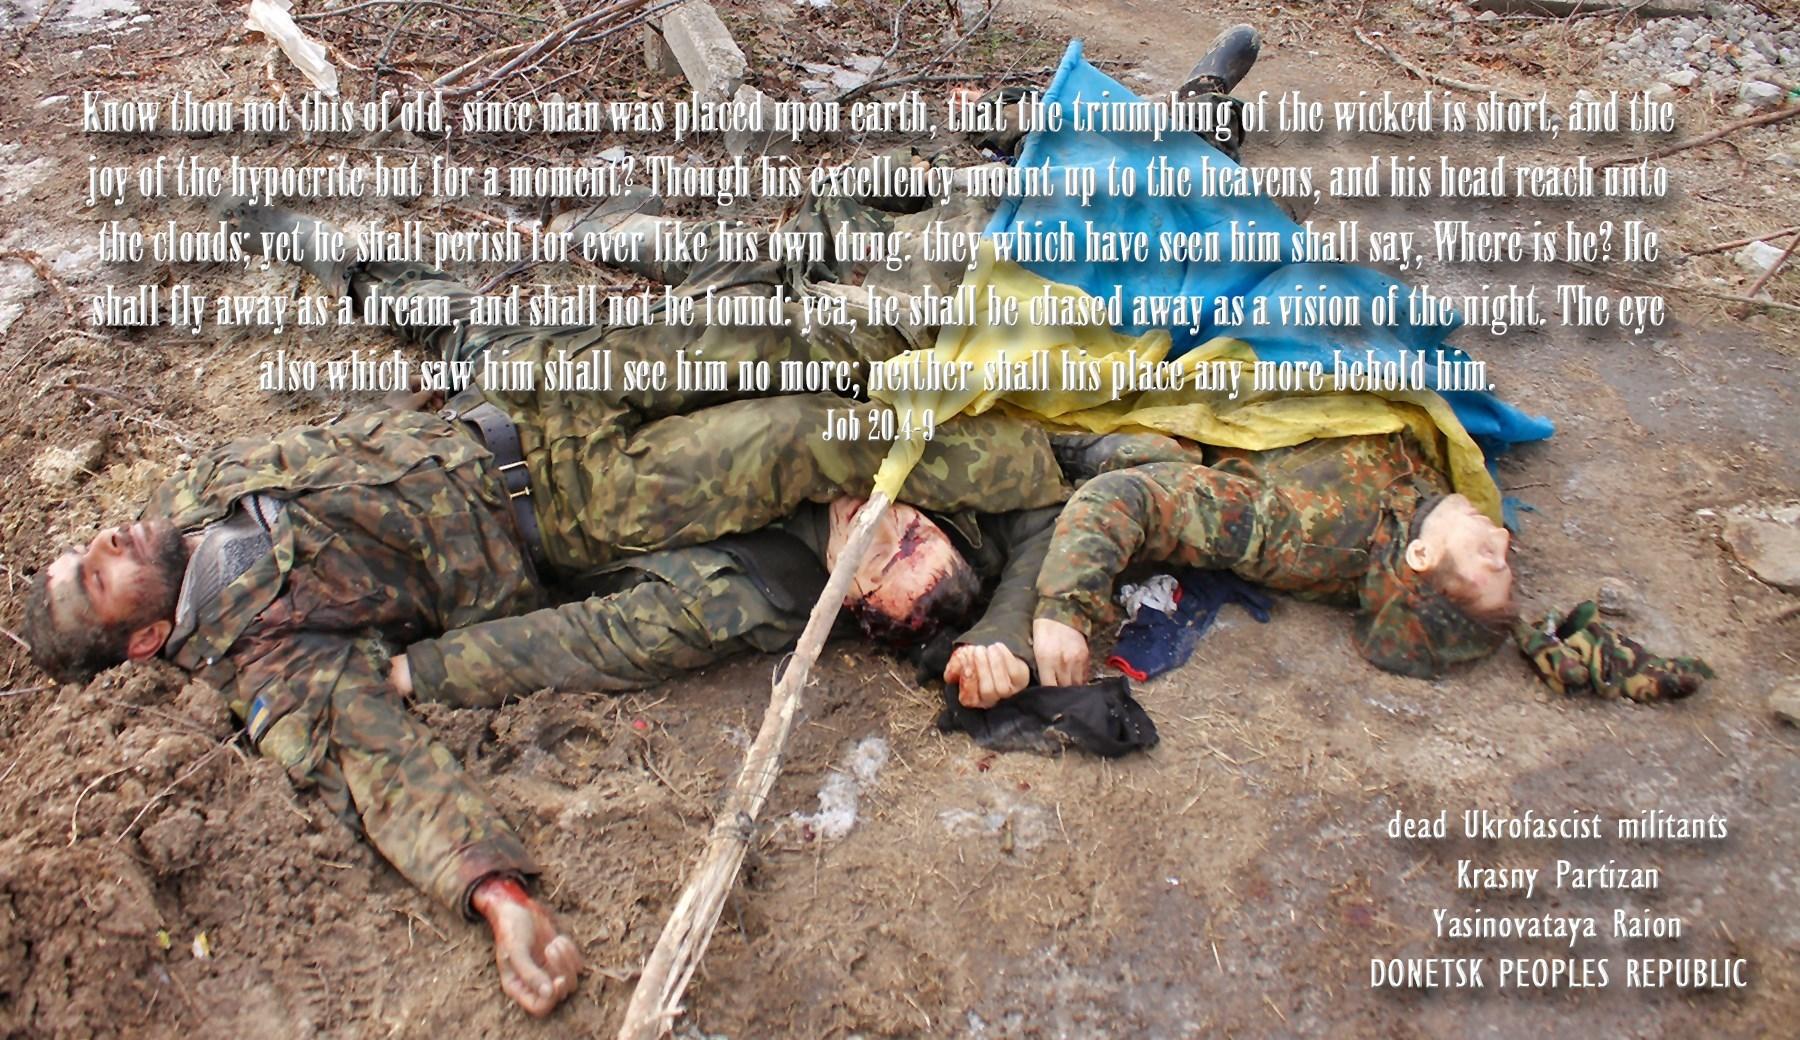 00 Job. dead ukrainian soldiers, Krasny Partizan 01. 06.06.15